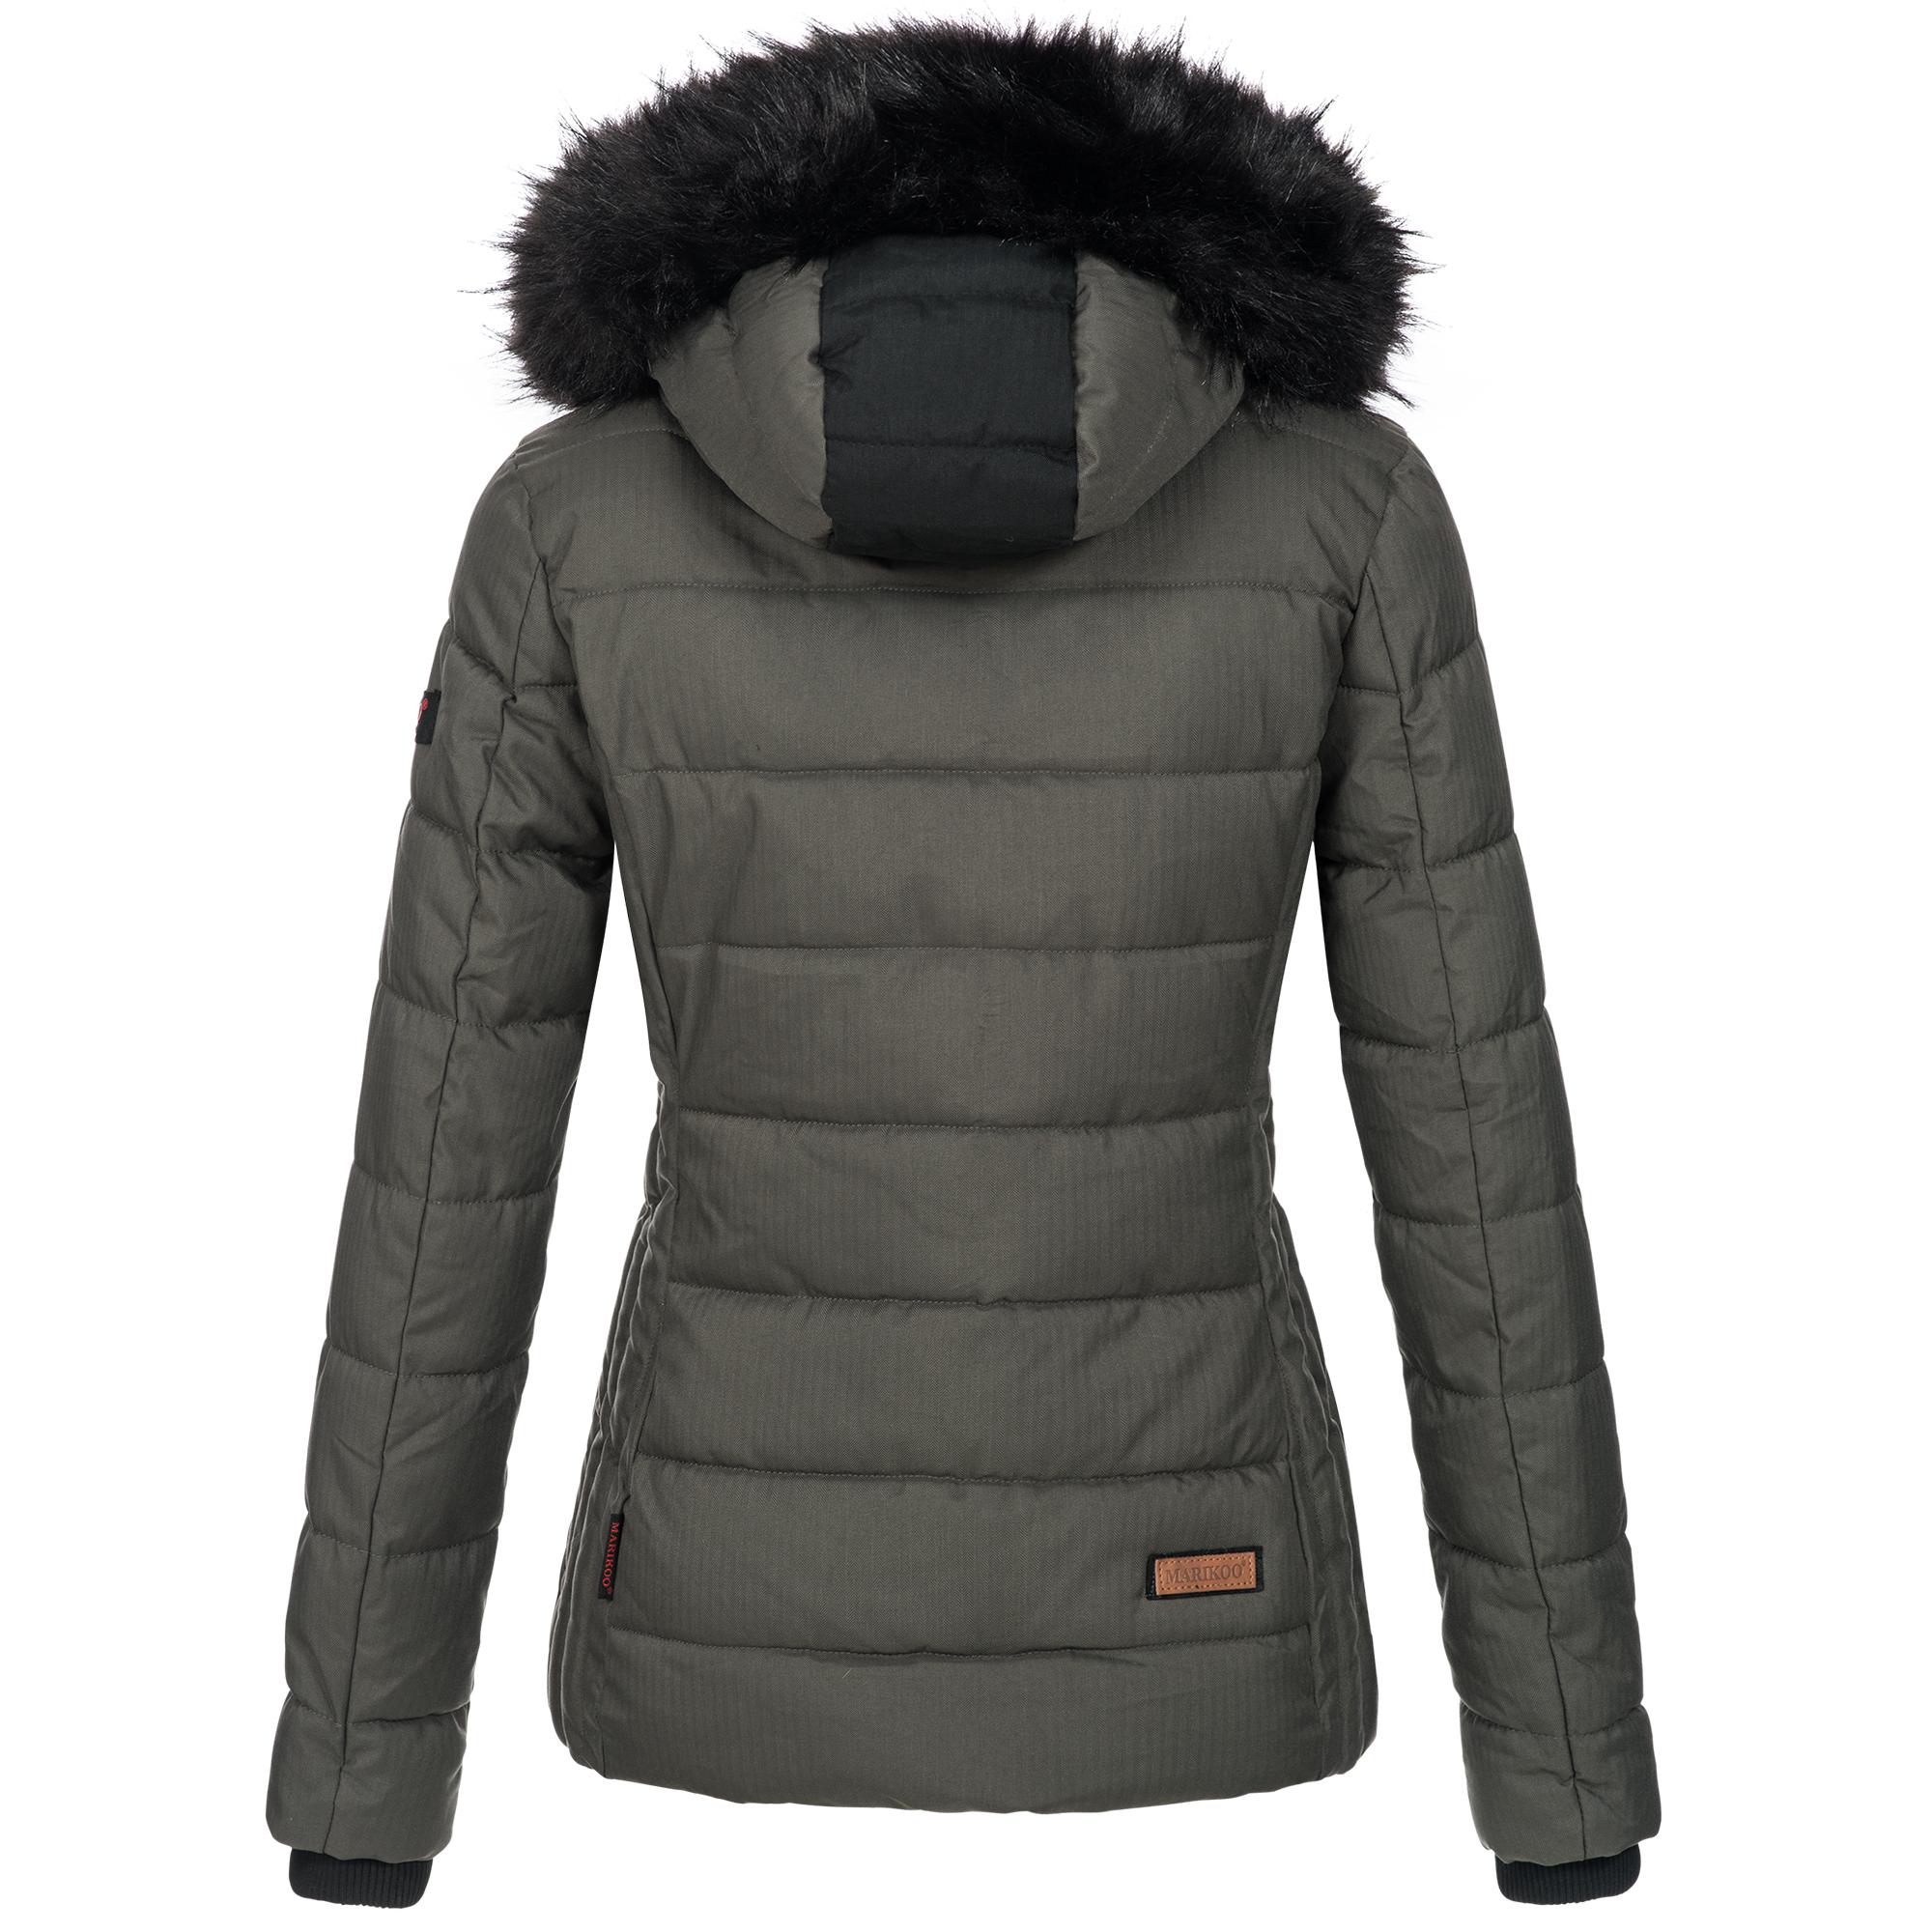 Marikoo warme Damen Winter Jacke Steppjacke Winterjacke gesteppt Parka NEU B391